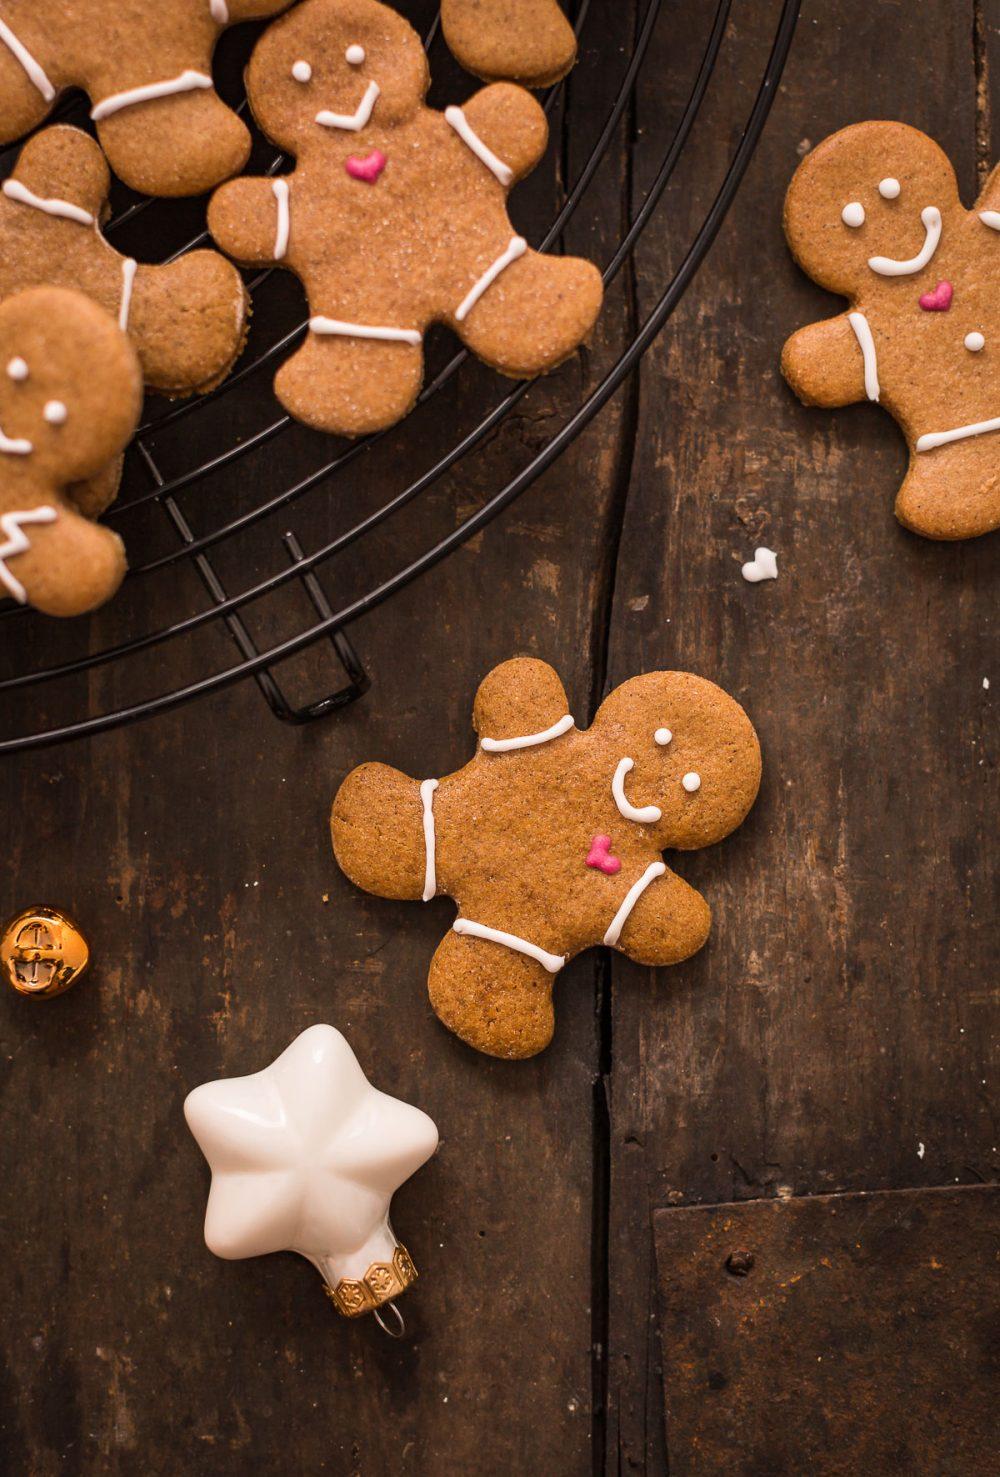 delicious vegan gingerbread man vegani - biscotti pan di zenzero vegani croccanti e friabili #vegan gingerbread